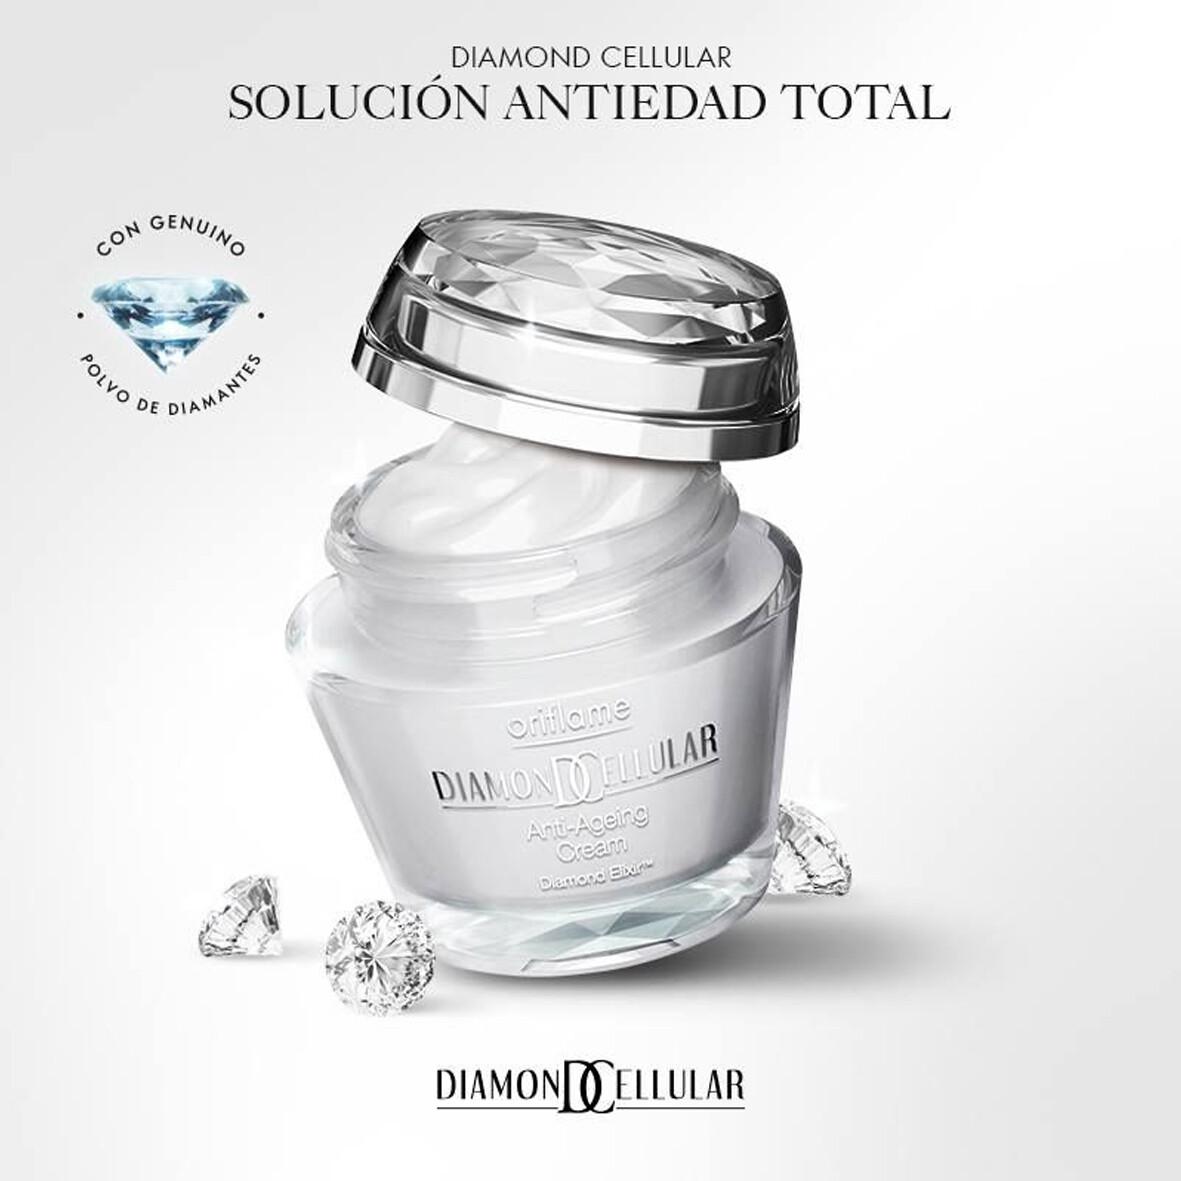 CREMA FACIAL ANTI-EDAD DIAMOND CELLULAR - ORIFLAME